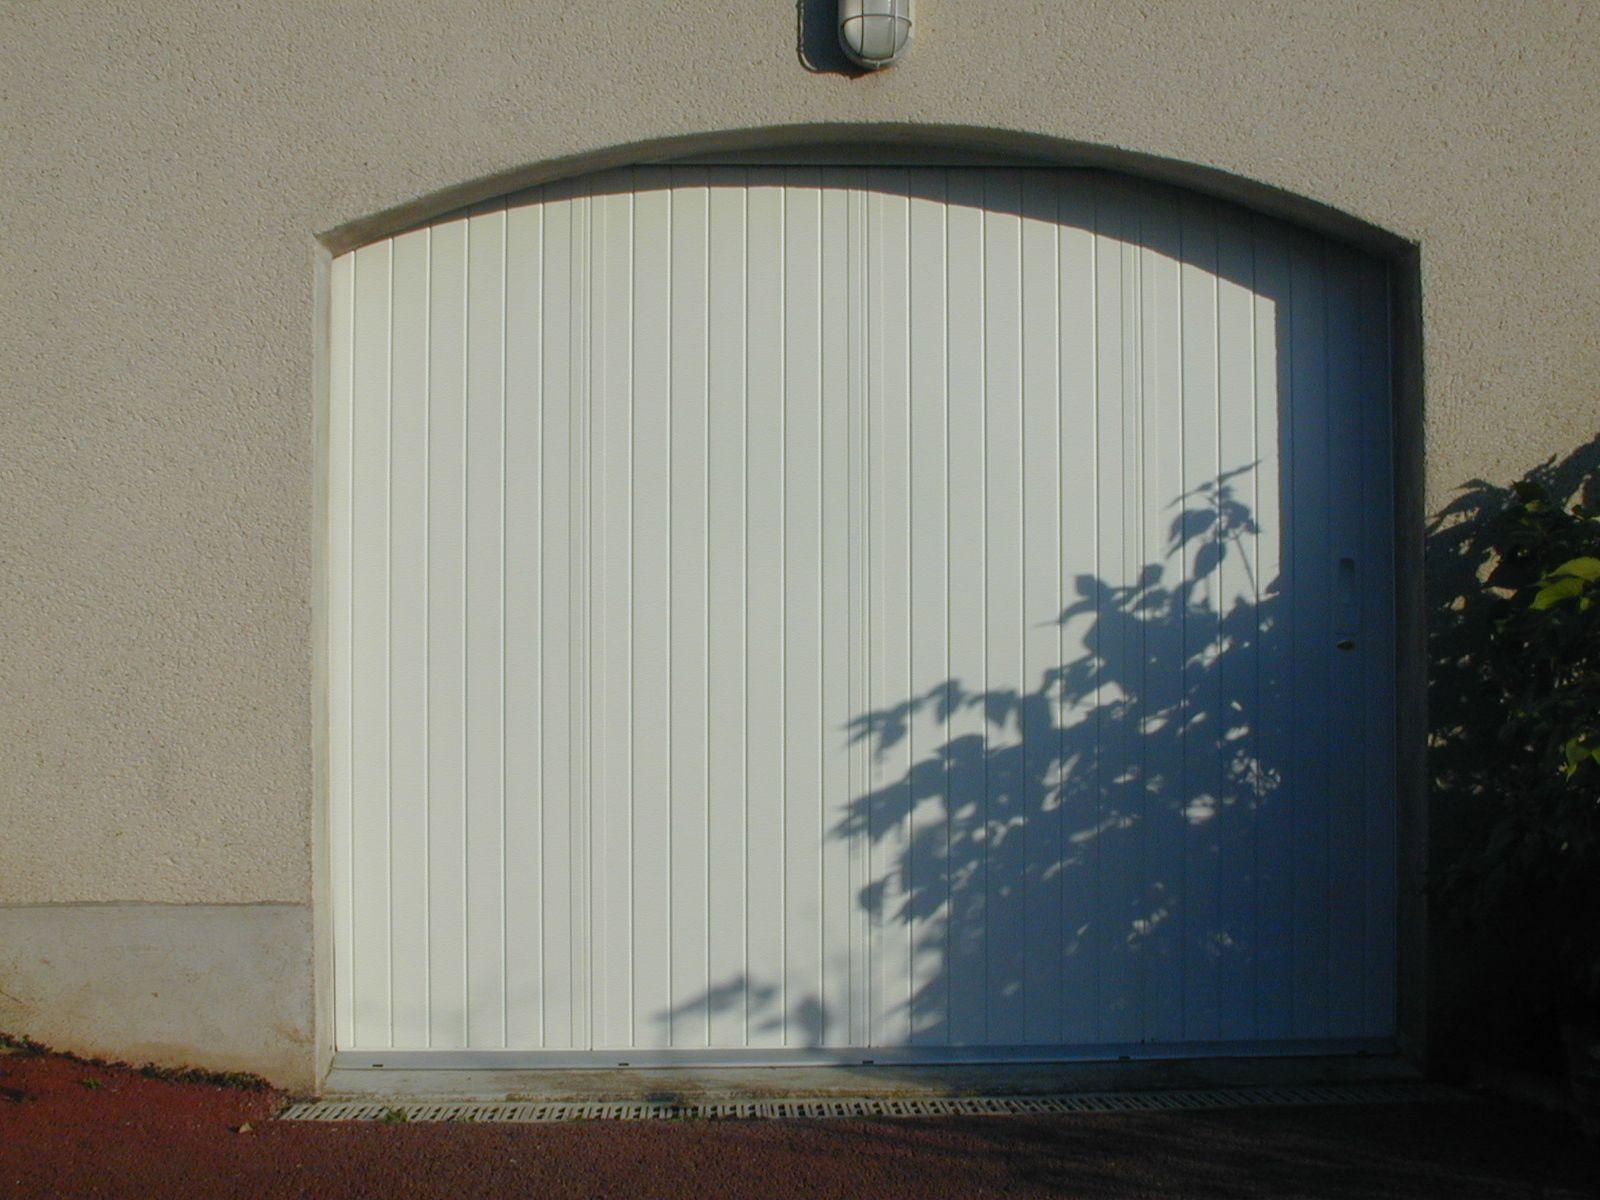 Modele Norvege Porte Garage Parement Mural